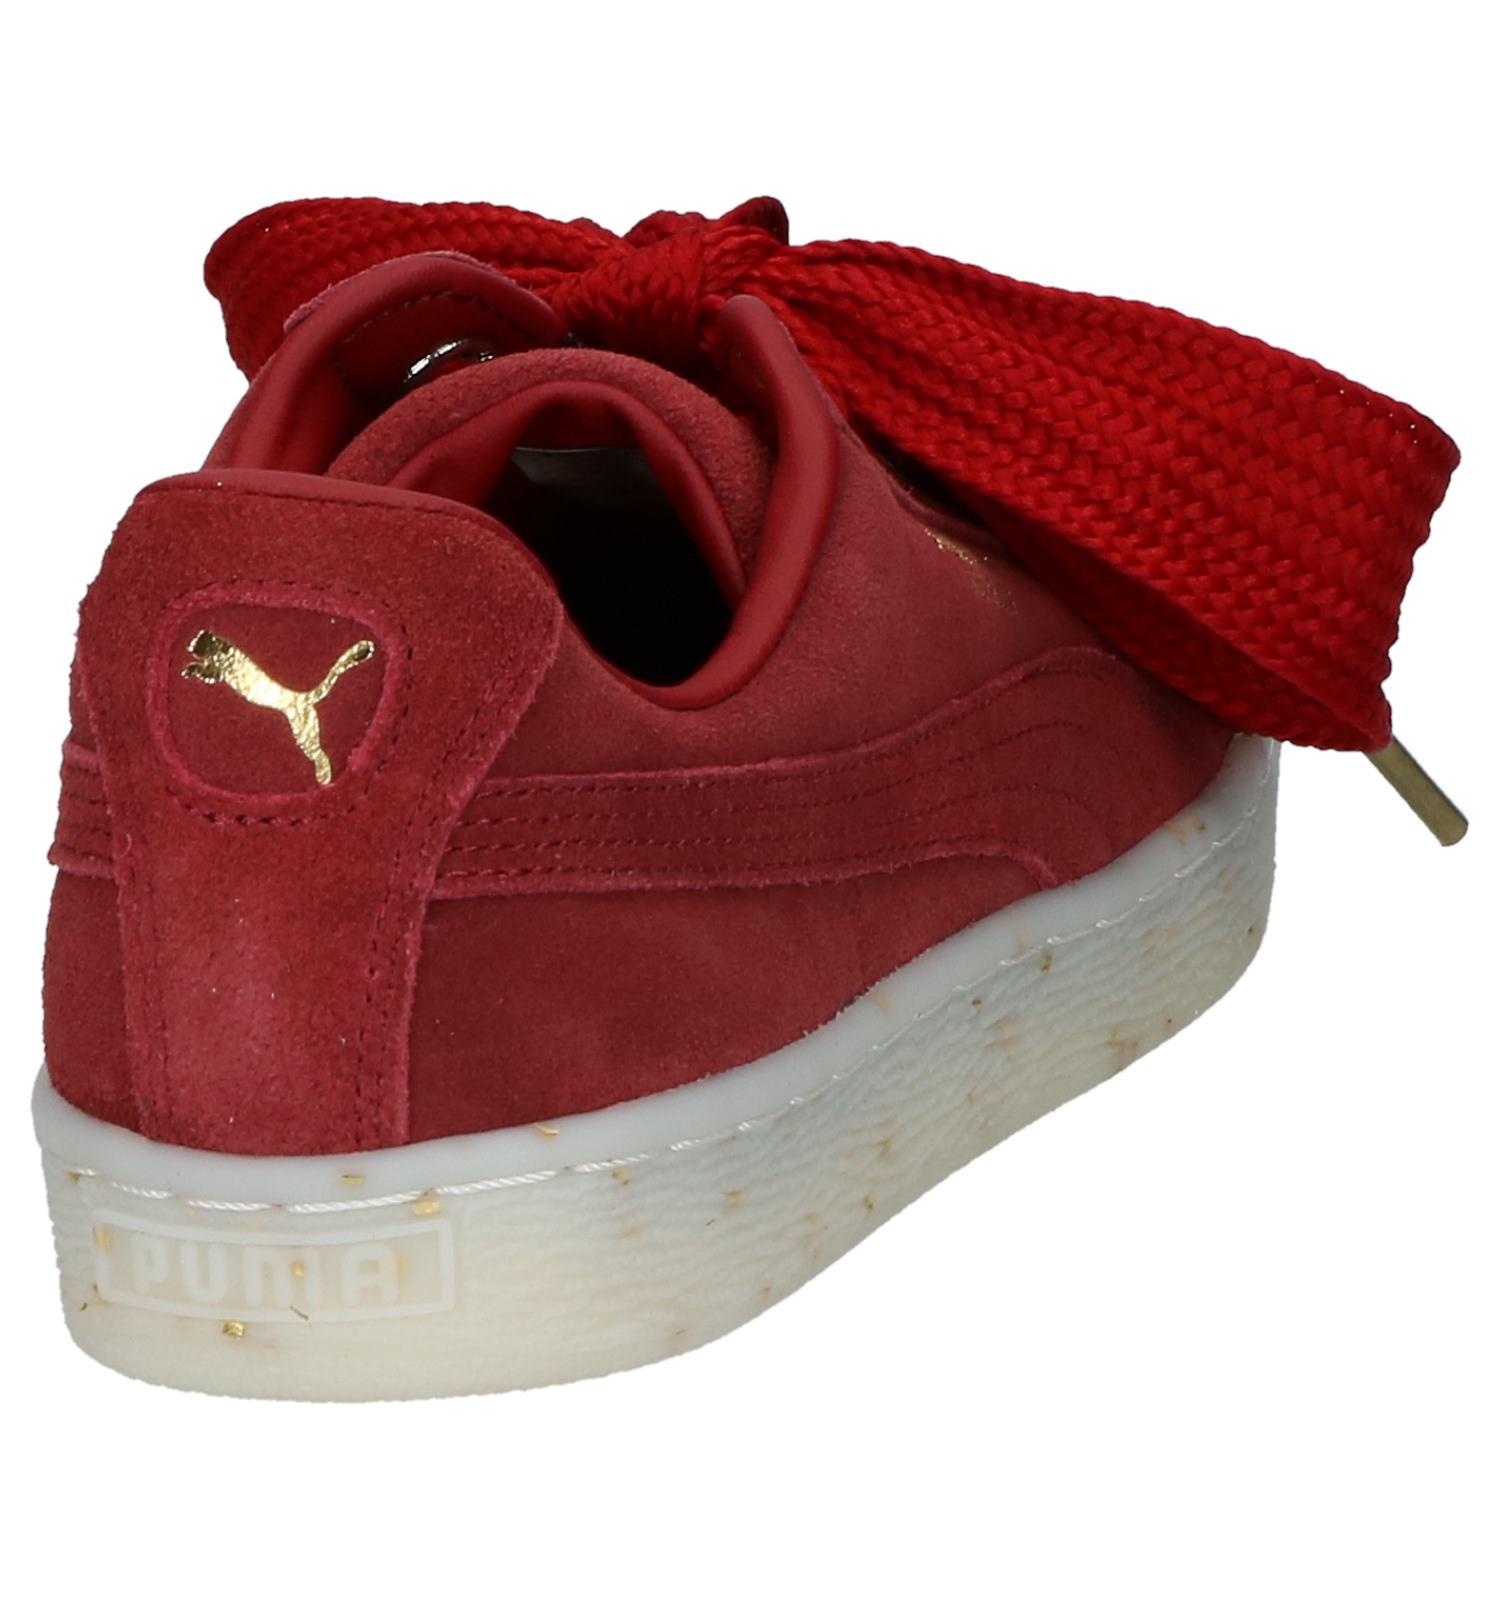 df07ee4ff09 Rode Lage Sportieve Sneakers Puma Suede Heart | TORFS.BE | Gratis verzend  en retour